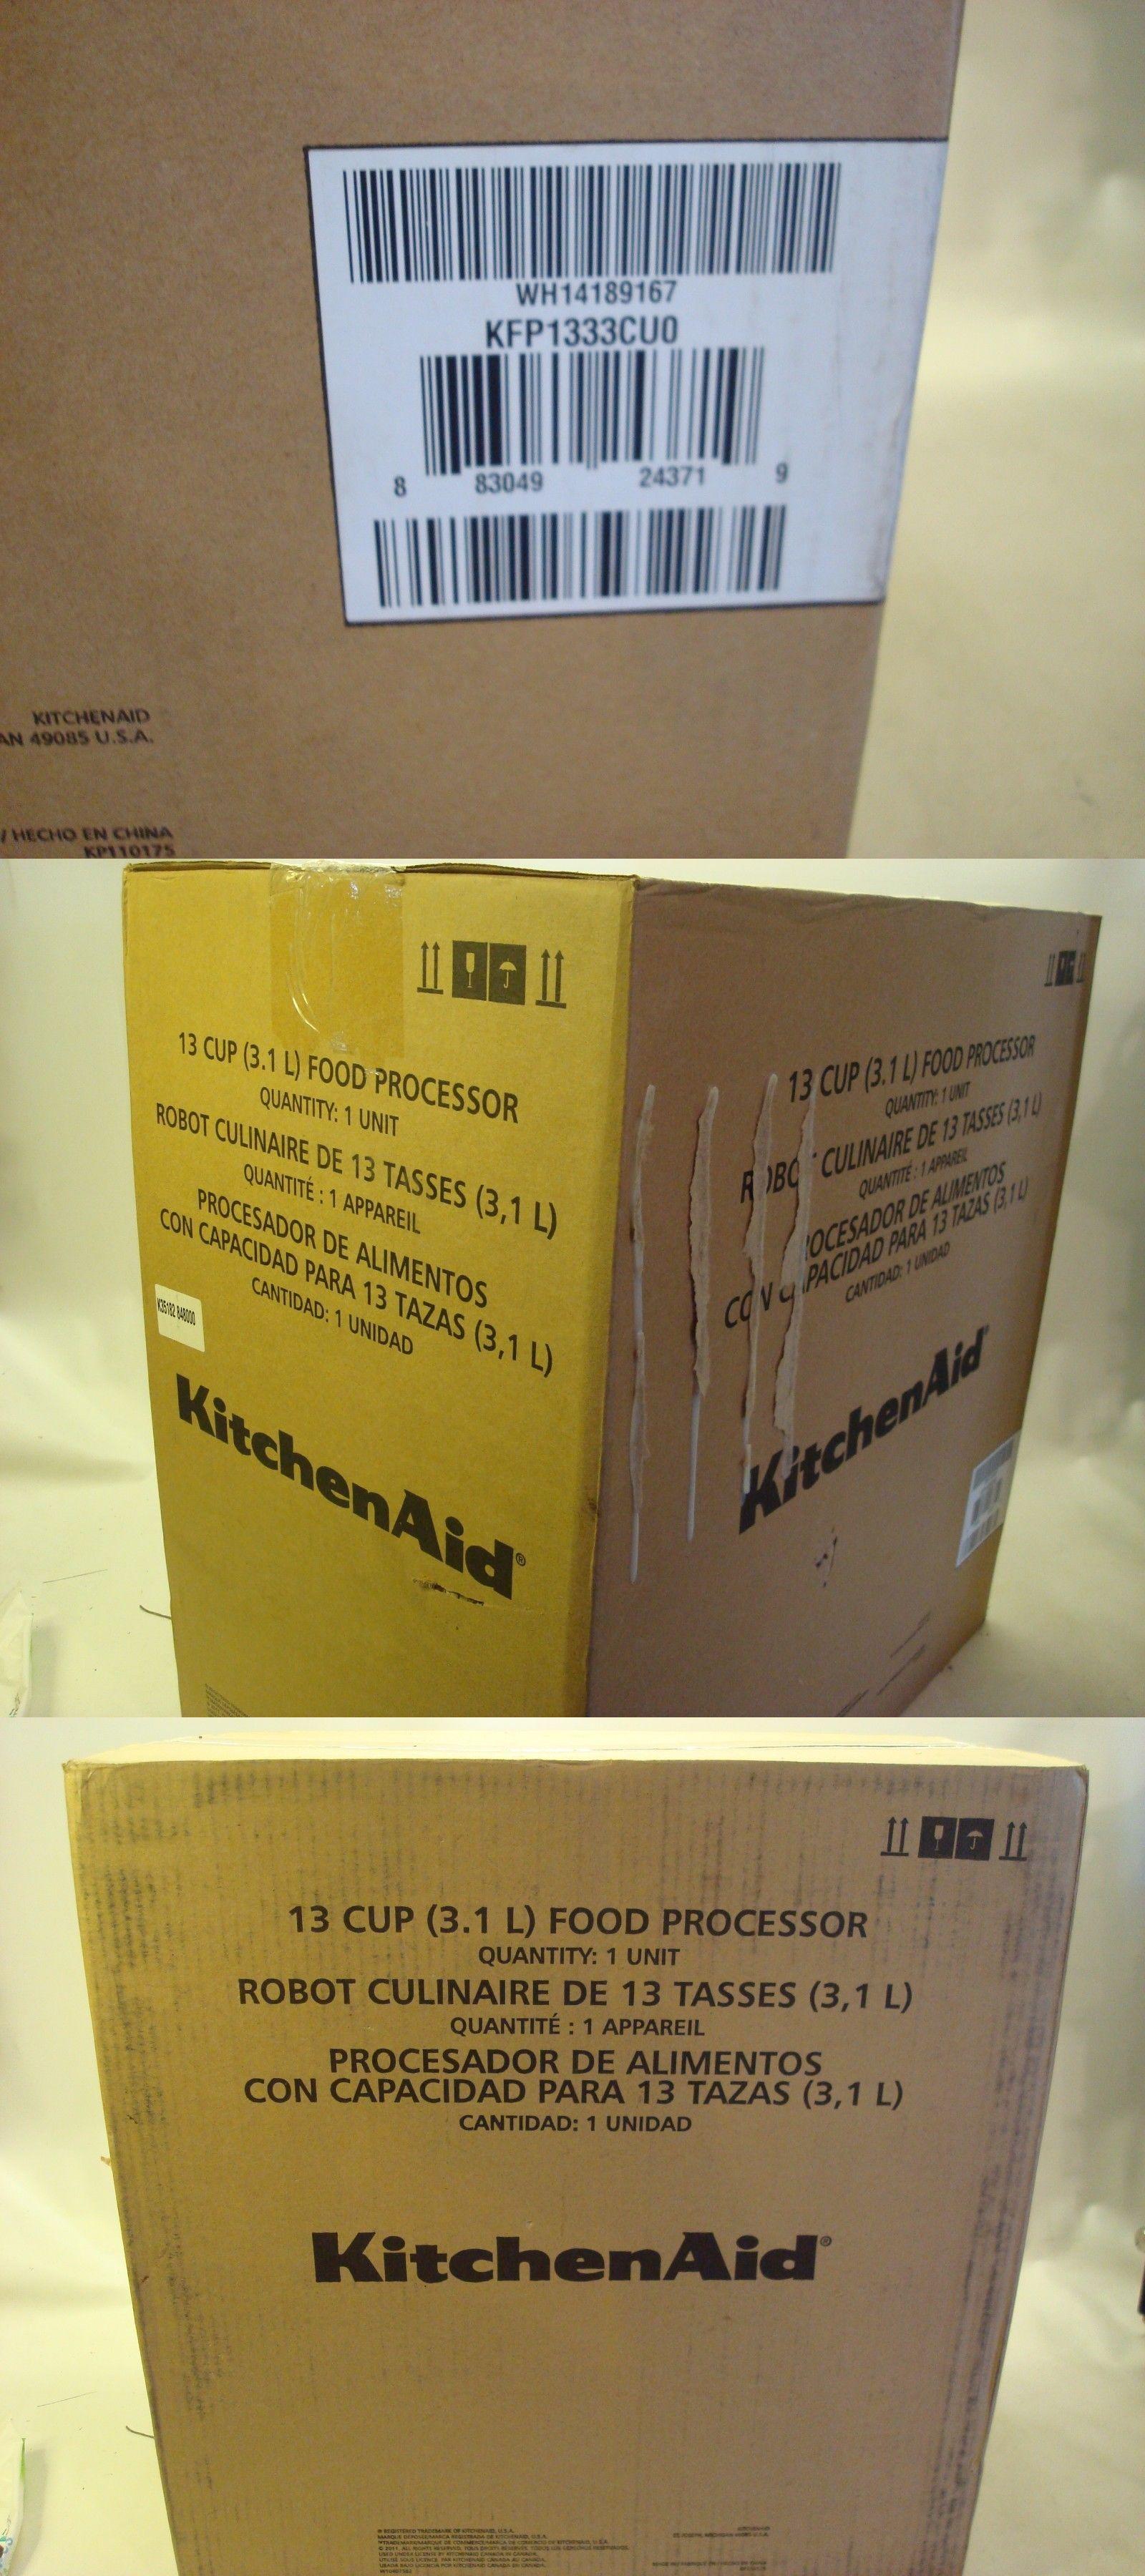 food processors 20673 new in box kitchenaid 13 cup 3 1l wide mouth rh pinterest com